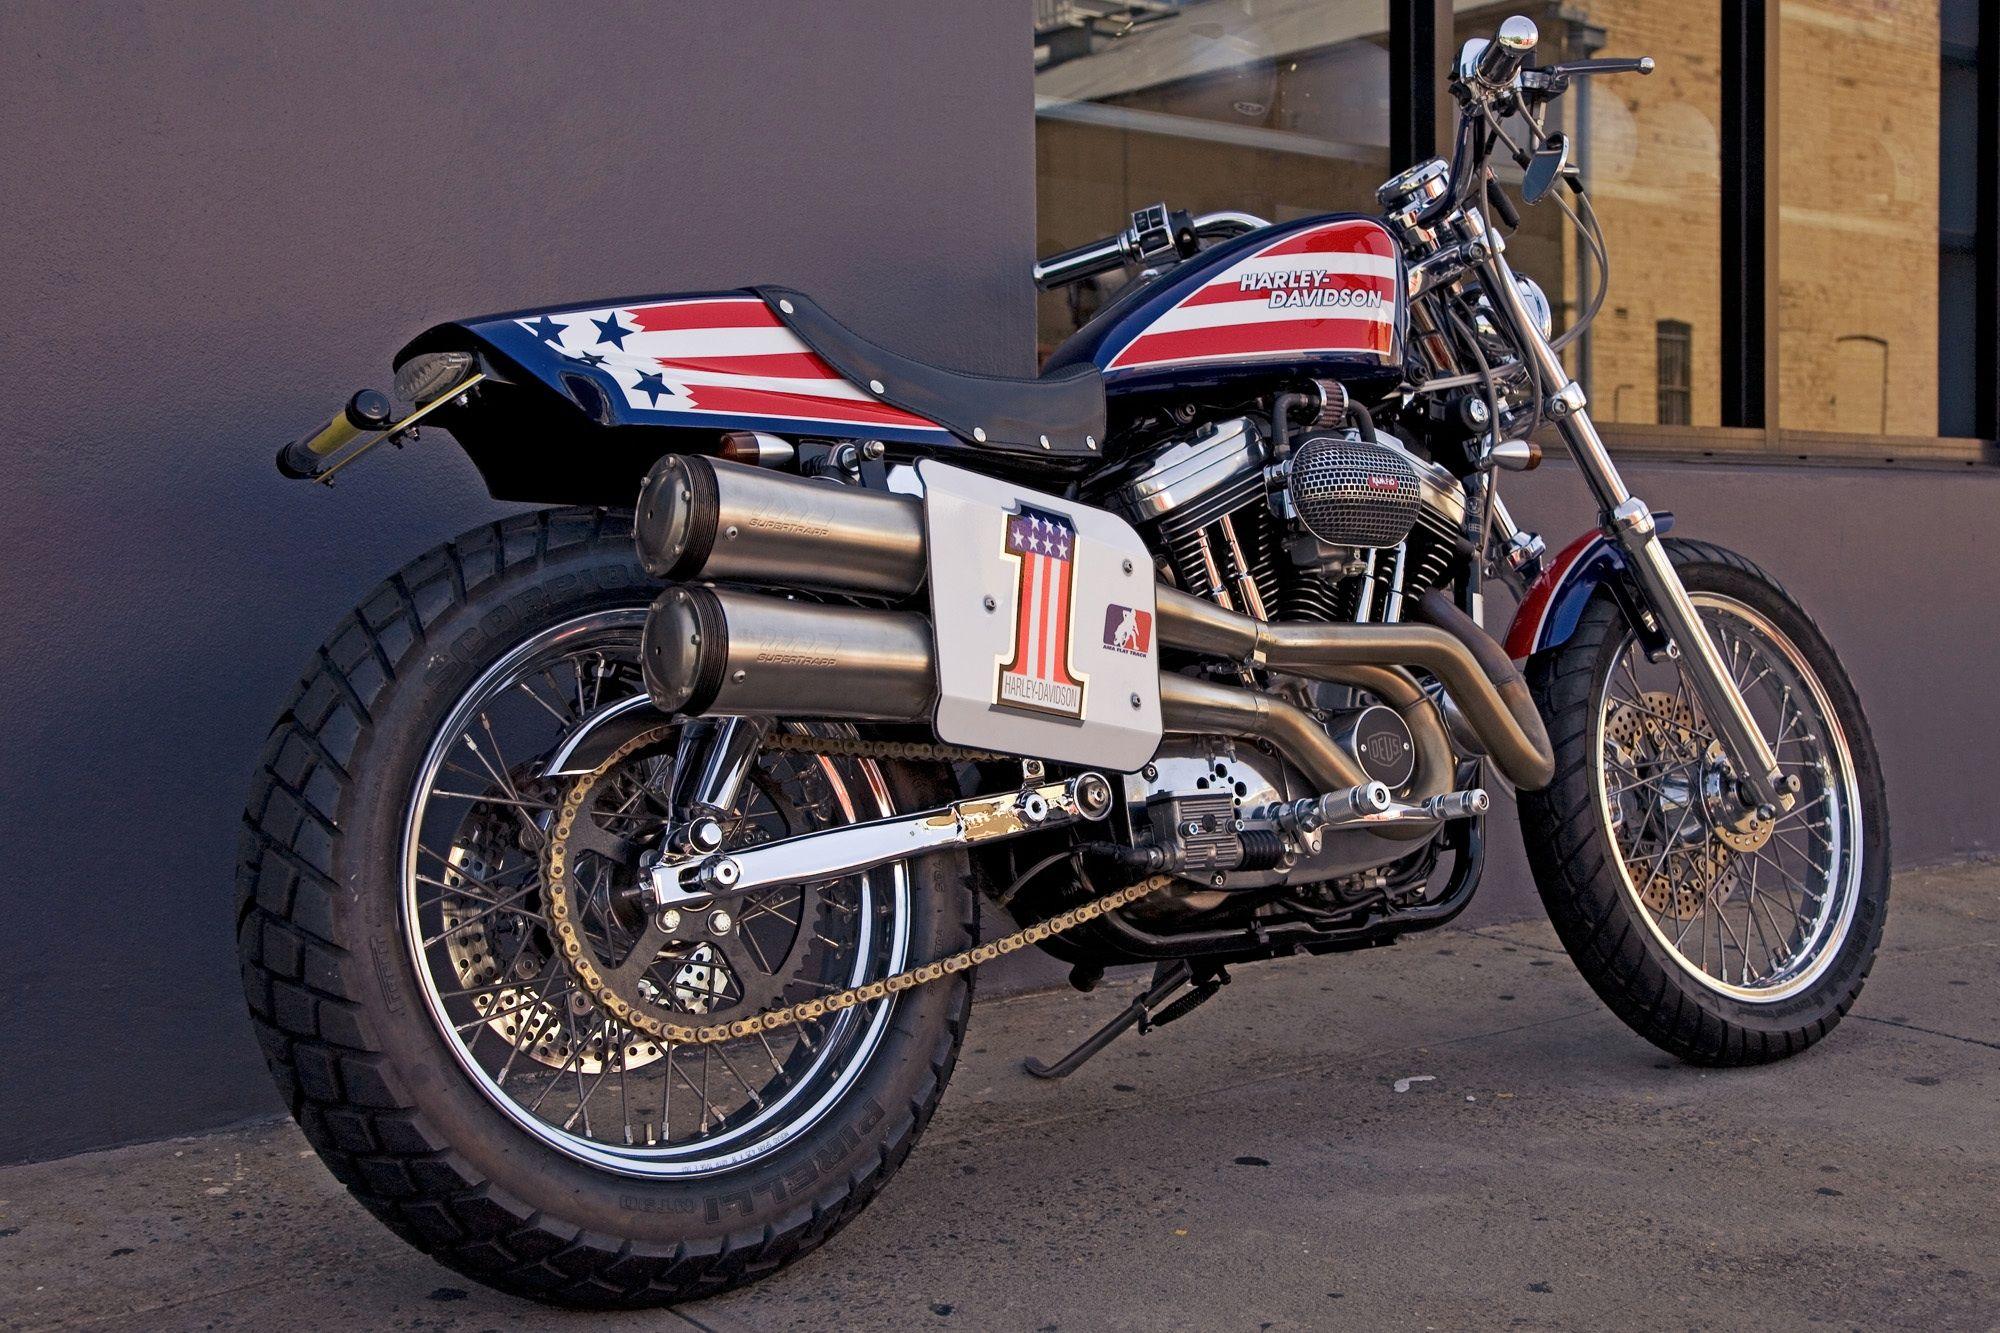 Evel Knievel Harley Davidson Xl1000: Evel Knievel 1200